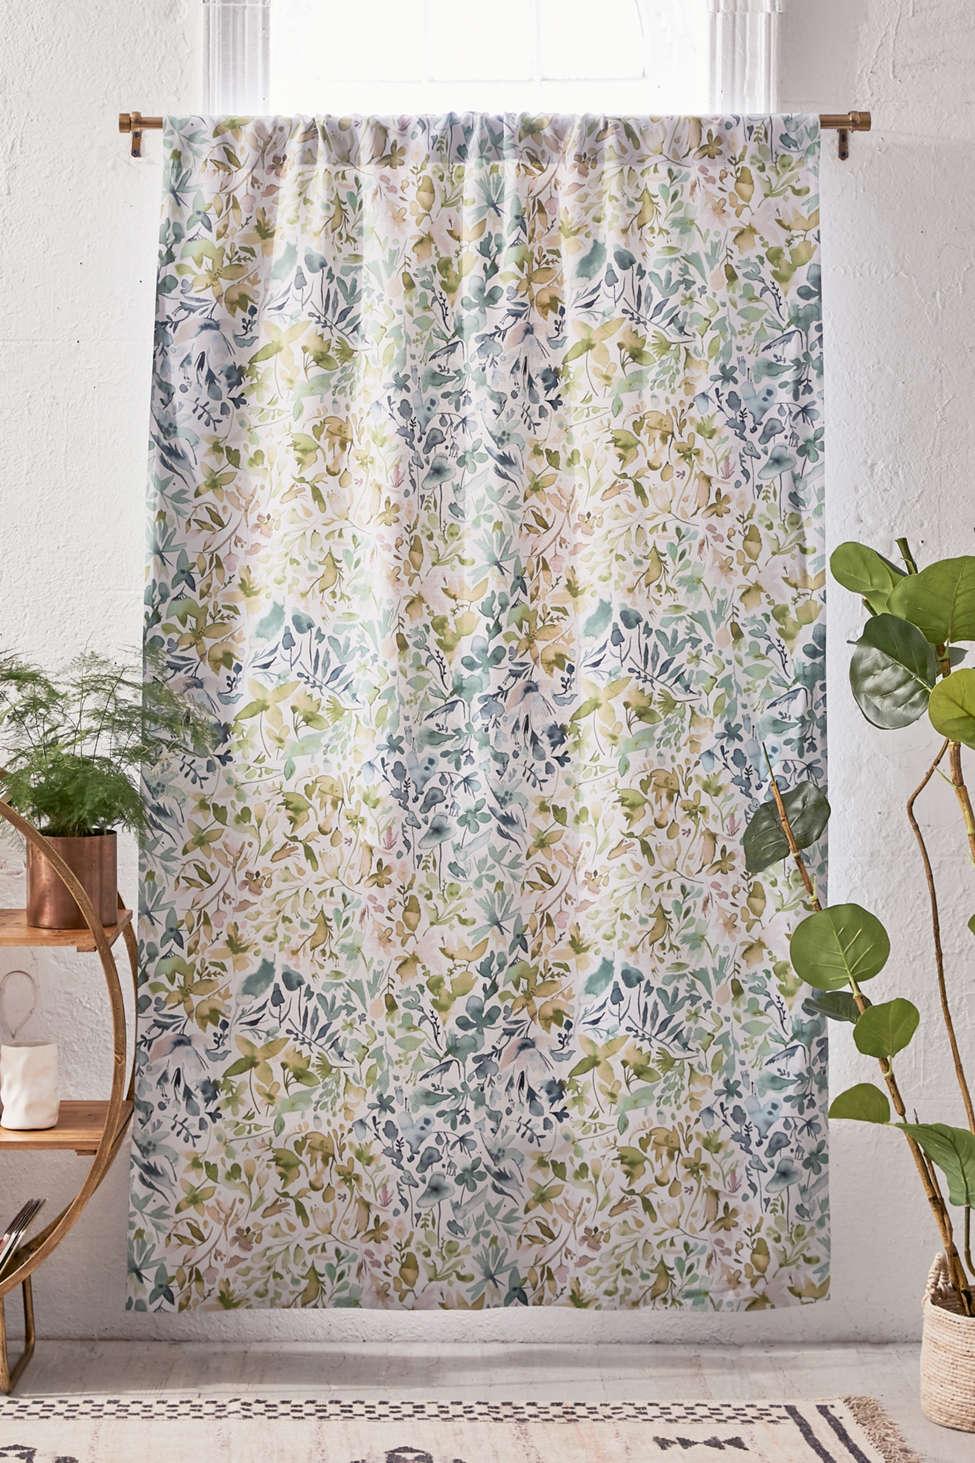 Slide View: 1: Ninola Design For Deny Green Flowers + Ivy Room Darkening Window Panel